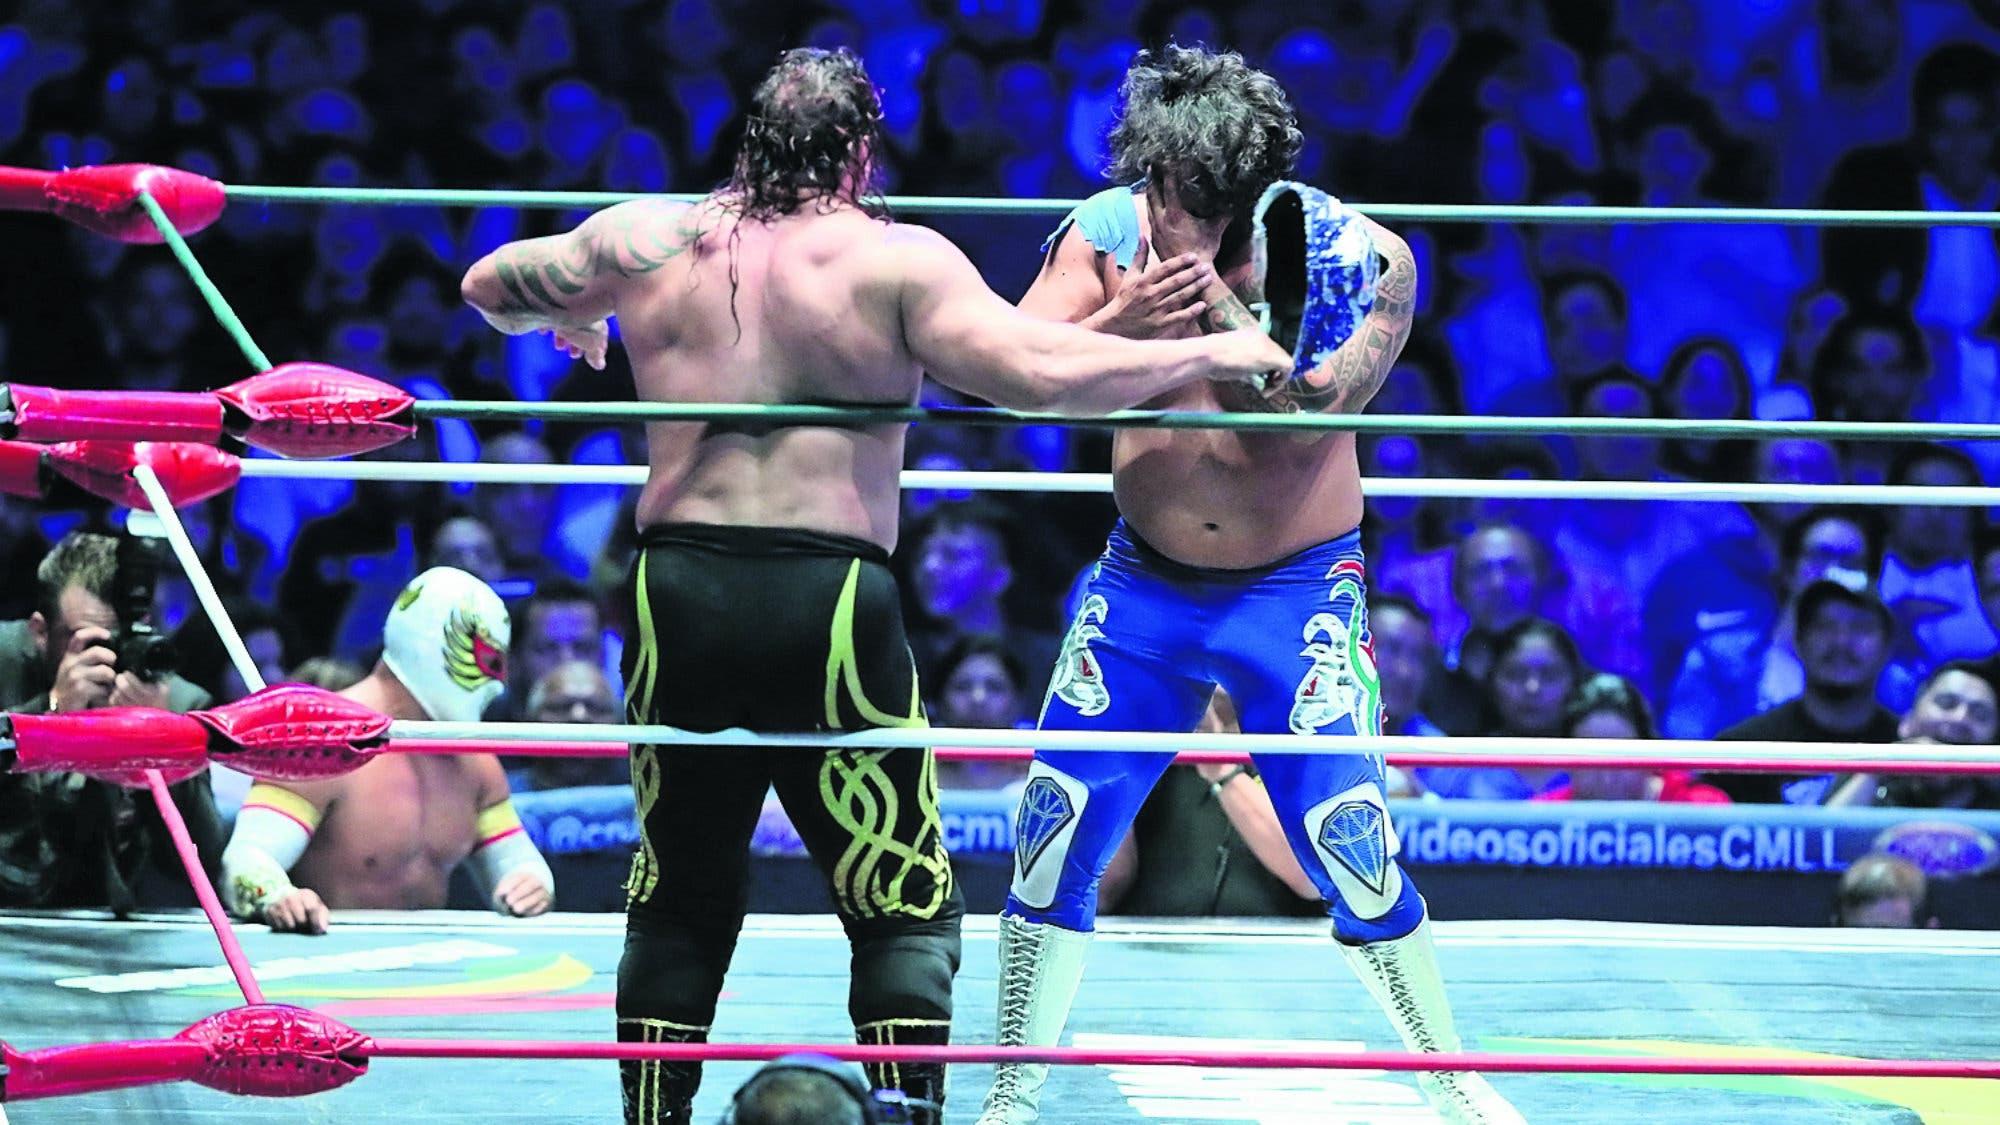 Lucha Libre: 'Diamante Azul' y Gilbert 'El Boricua' se enfrentarán en 'Máscara vs Cabellera'